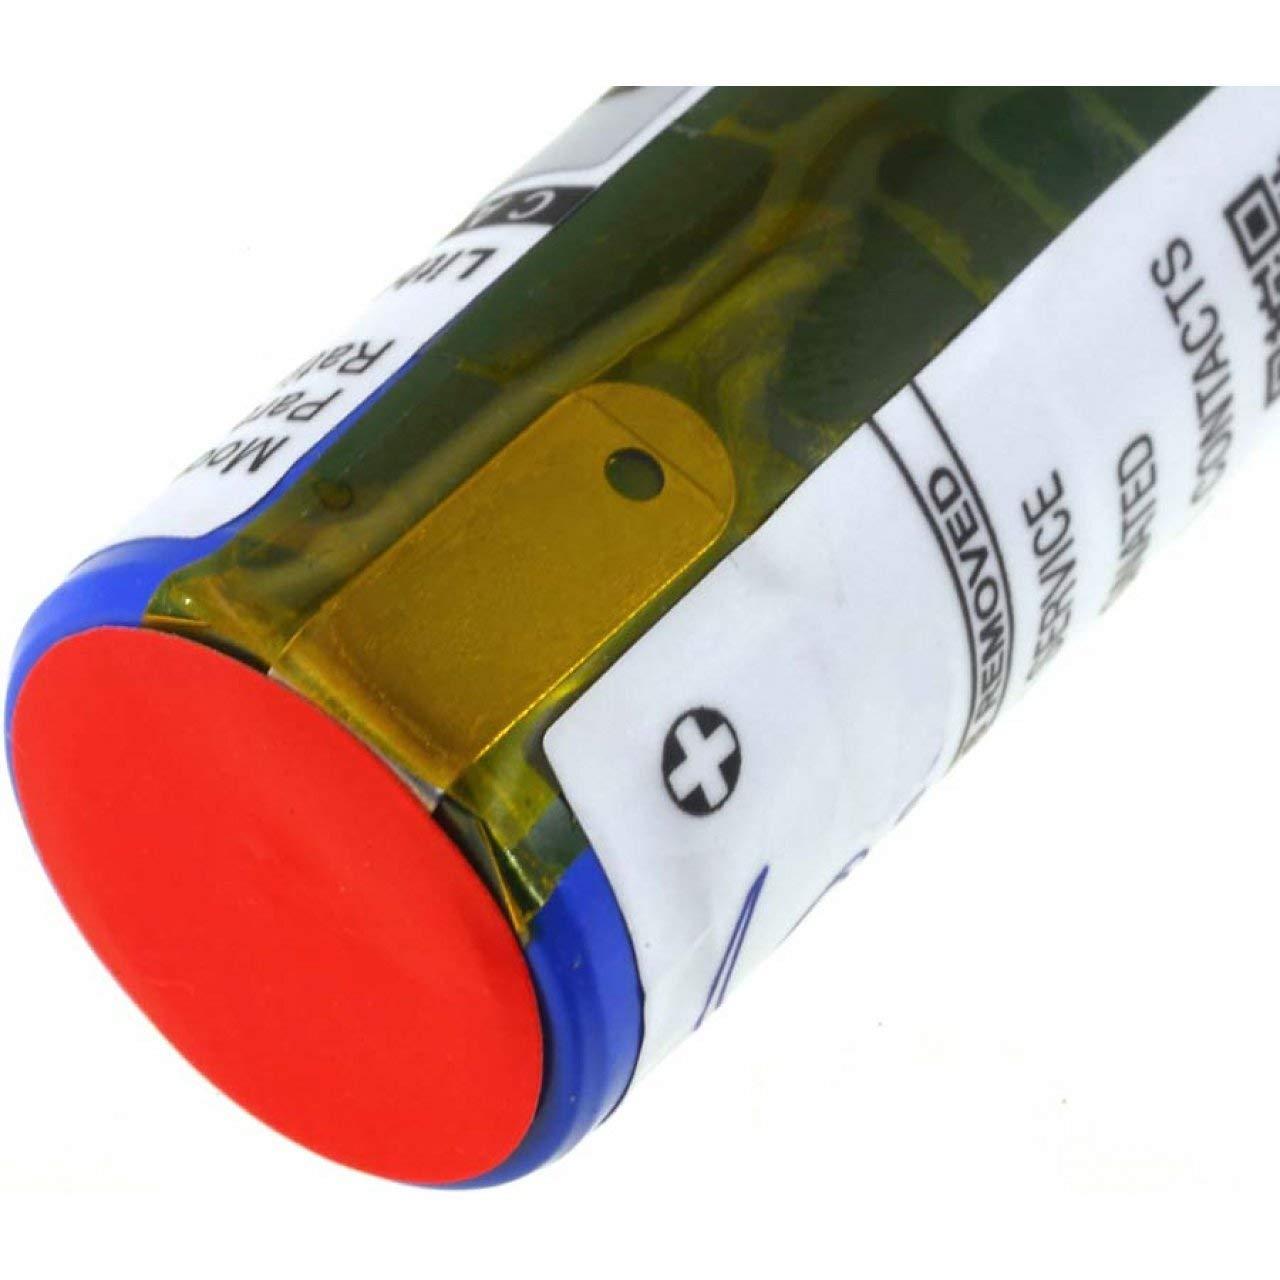 Batería para Afeitadora Eléctrica Philips Norelco 8894 X L, 3,7 V, Li-Ion [Batería para aparatos]: Amazon.es ...